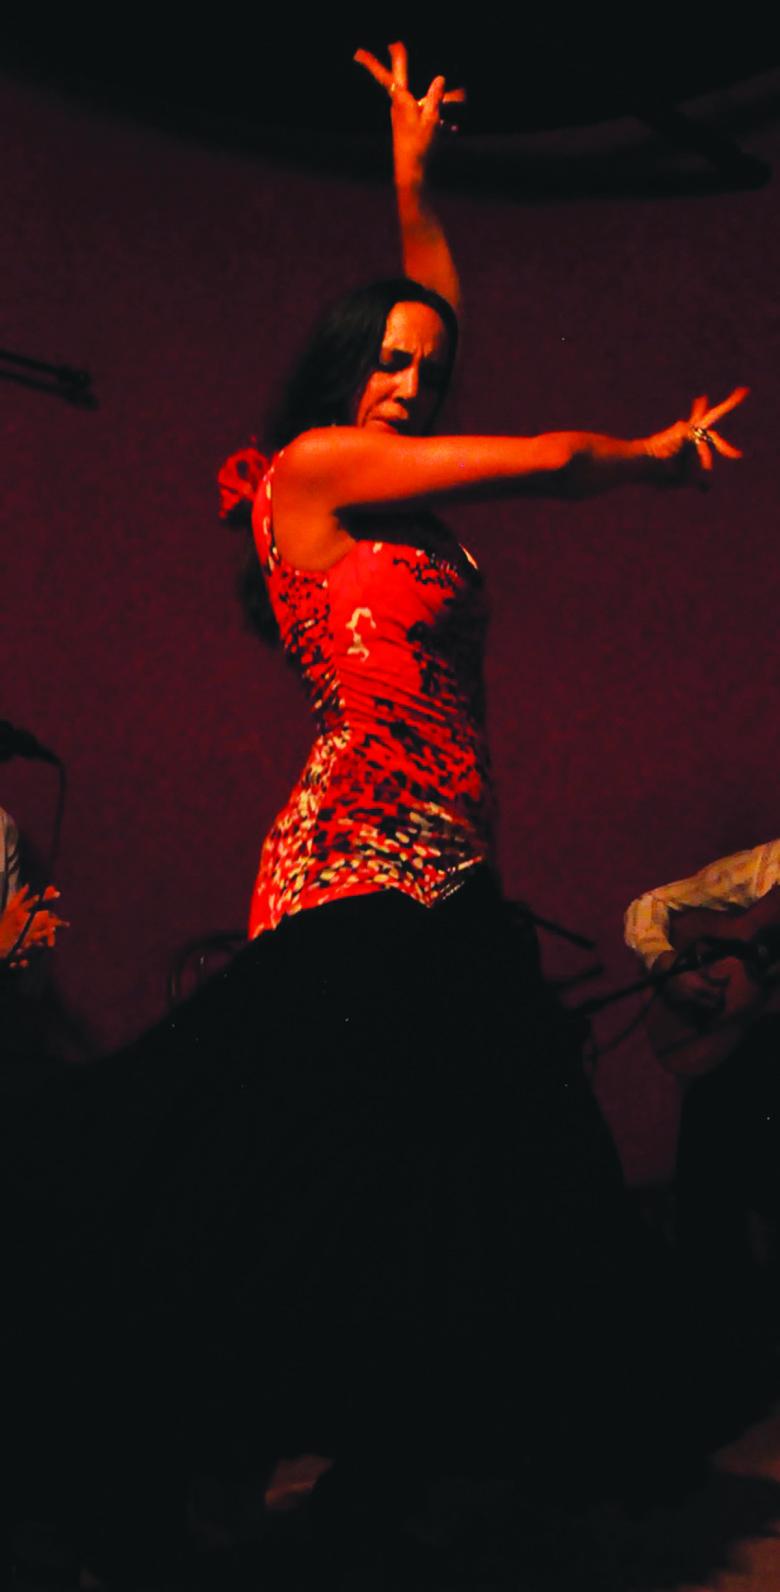 esther marion Arte de Flamencocmyk